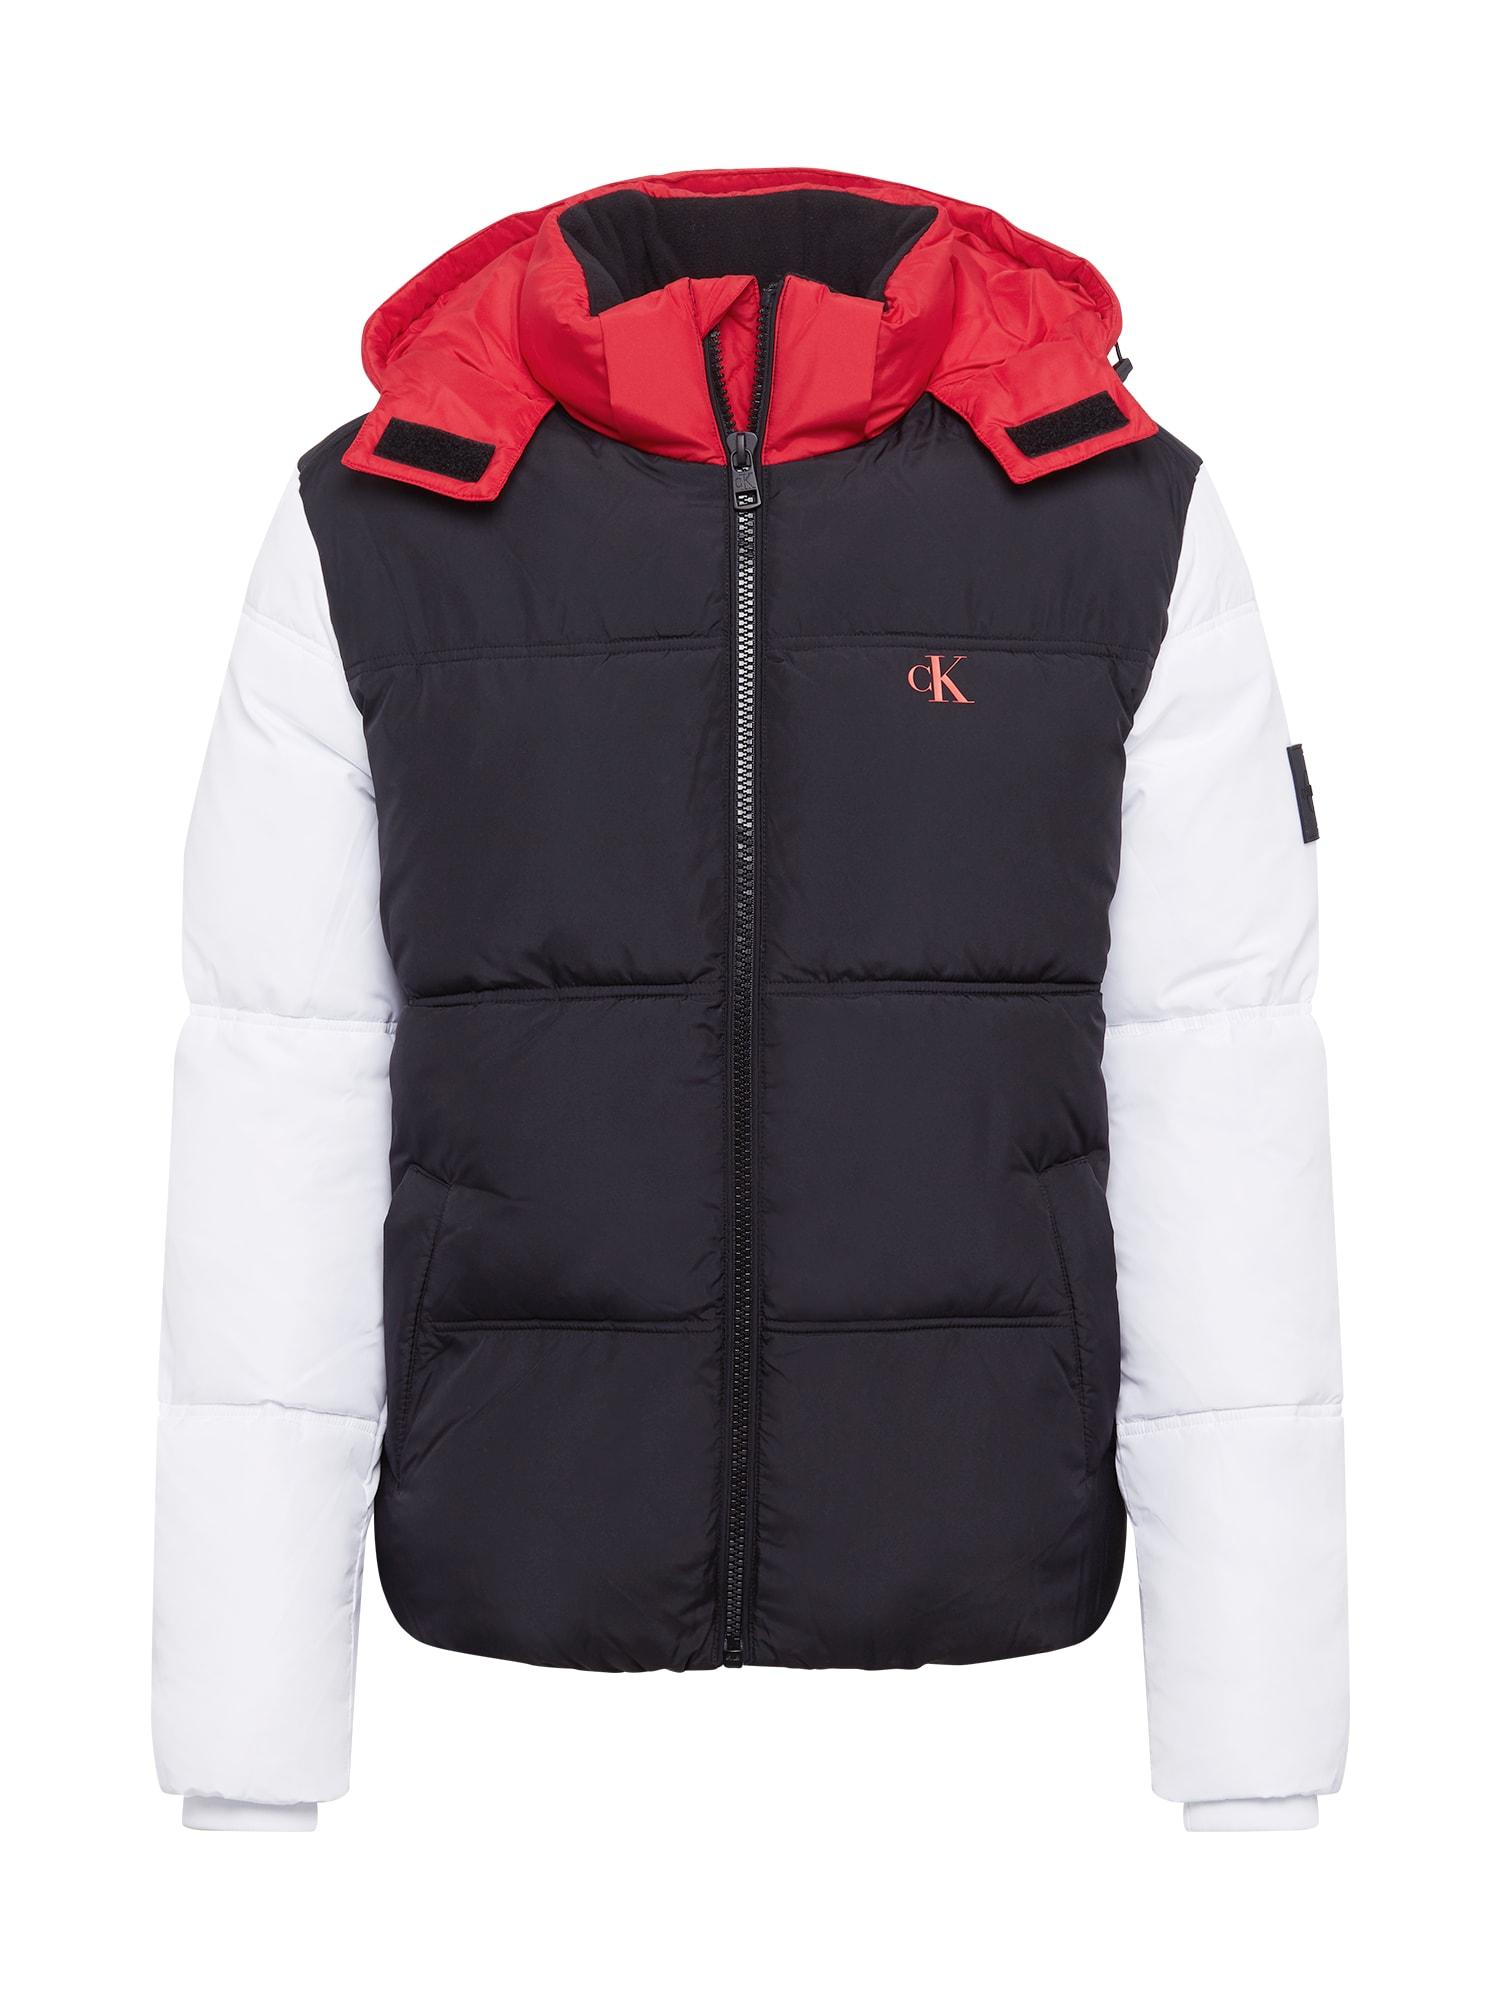 Calvin Klein Jeans Demisezoninė striukė raudona / juoda / balta